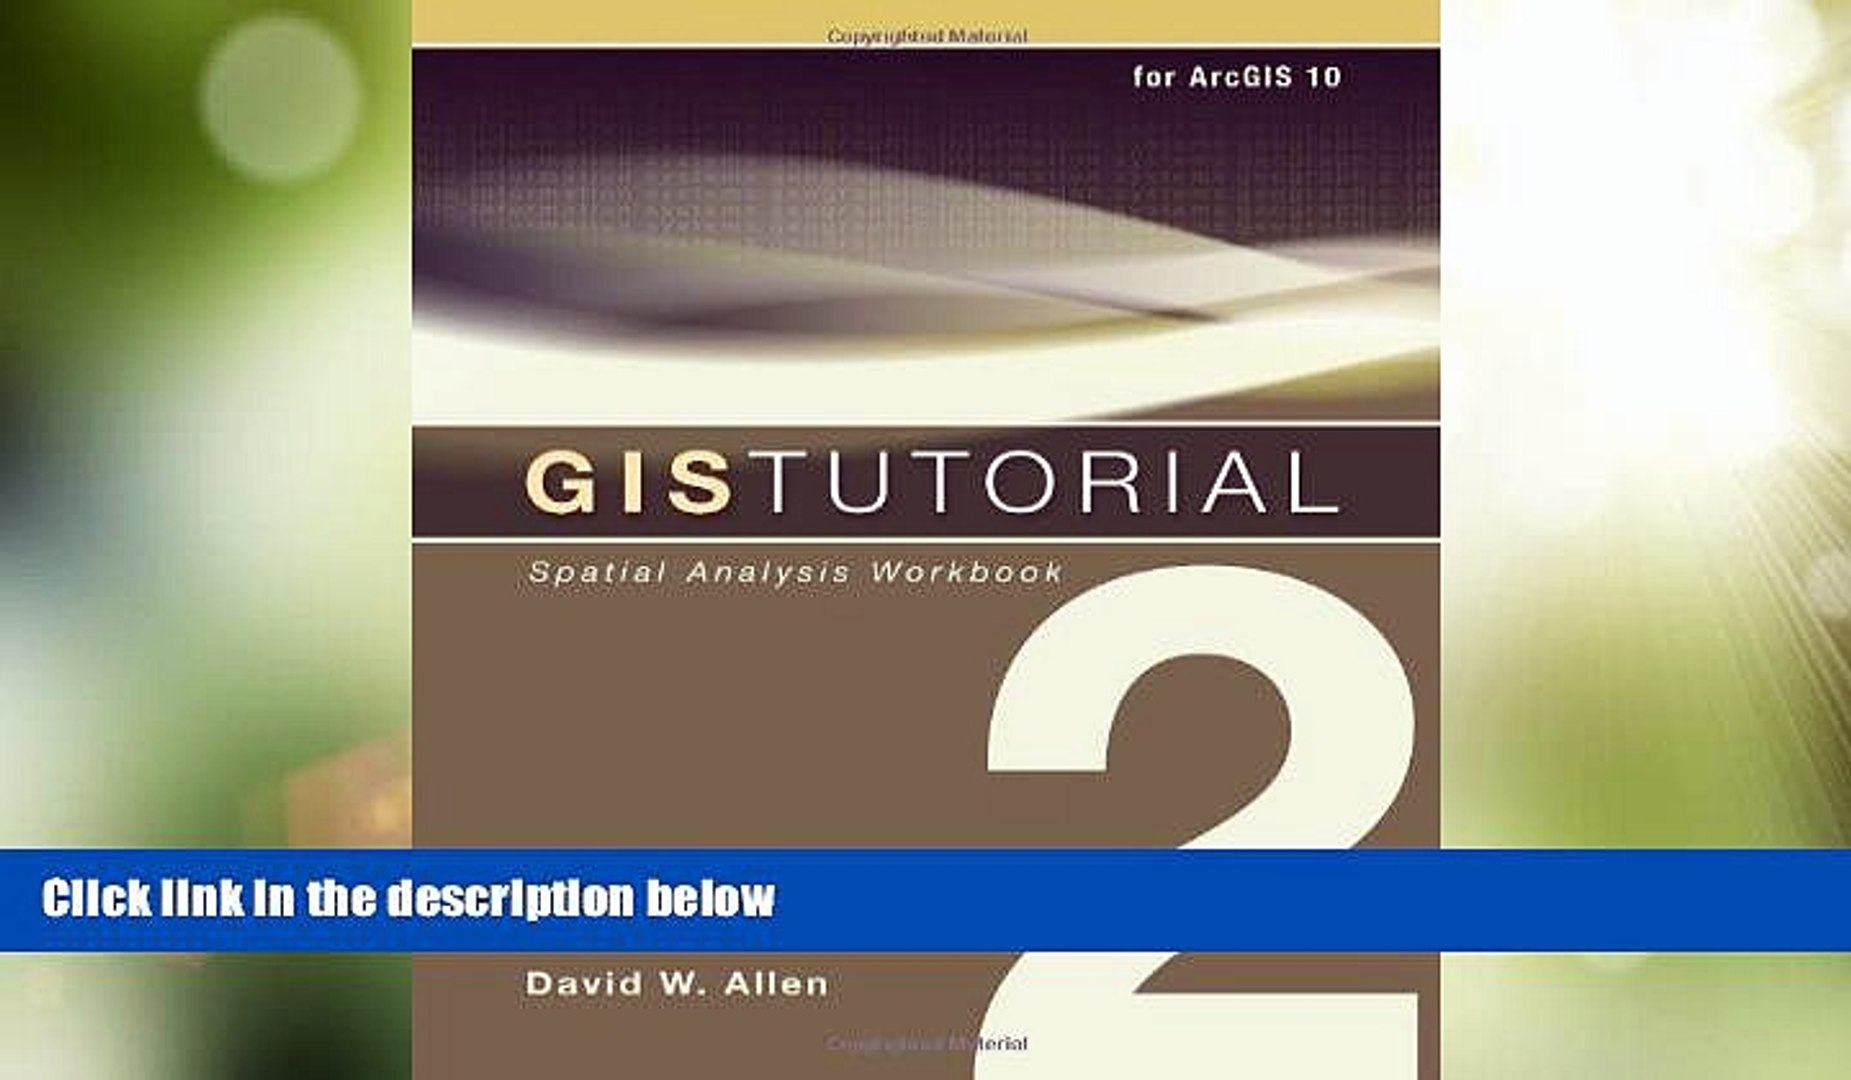 Spatial Analysis Workbook GIS Tutorial 2